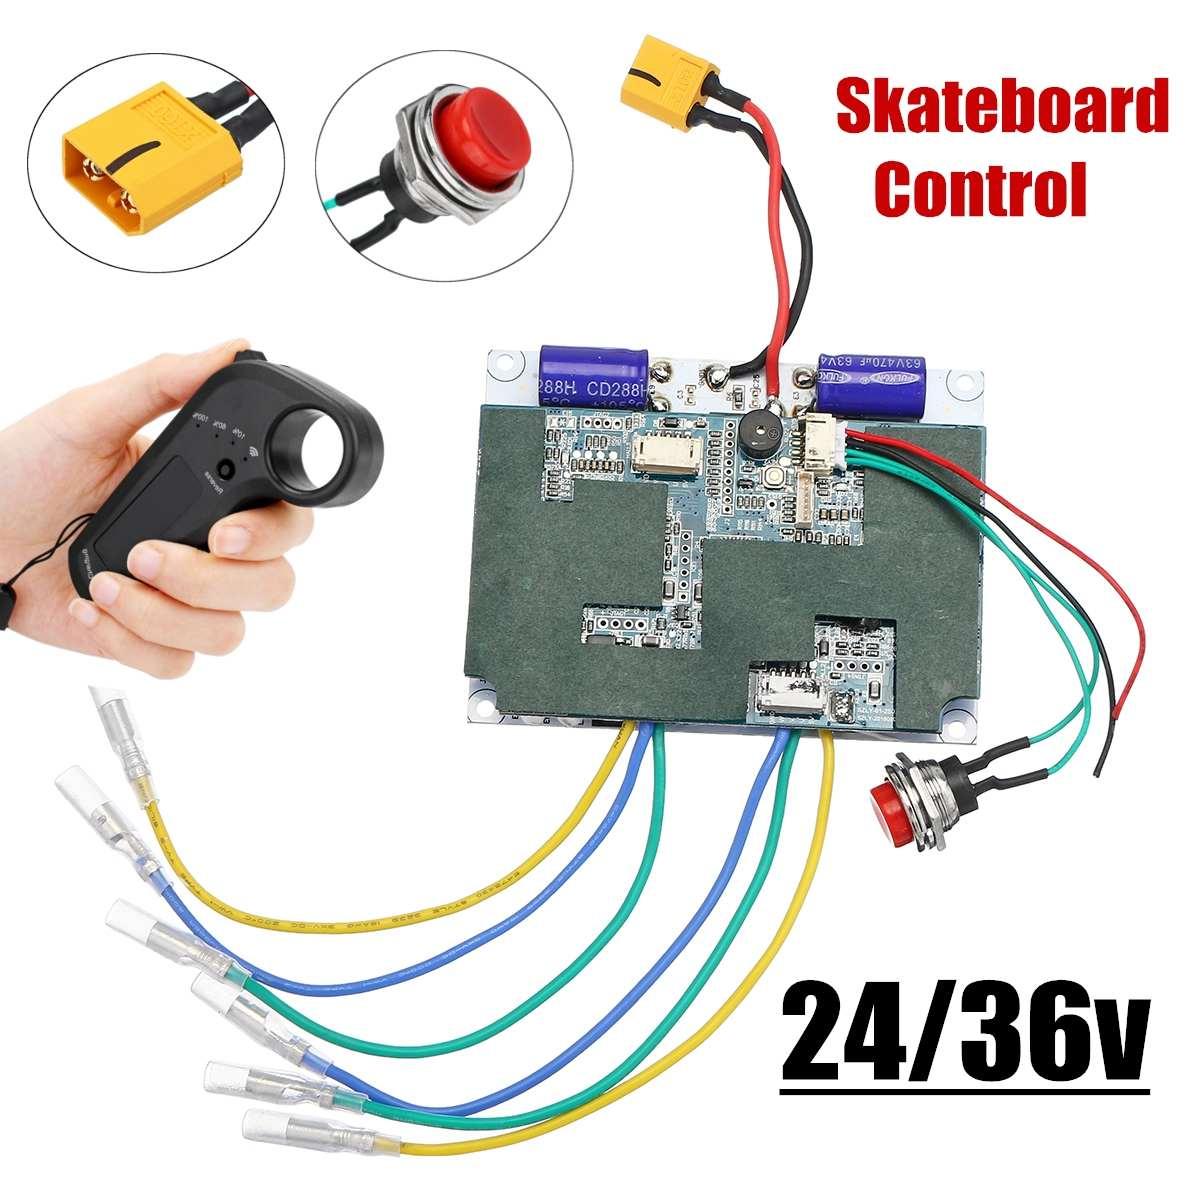 Hub//Belt Dual Motors Longboard Skateboard Controller With Remote ESC Substitute